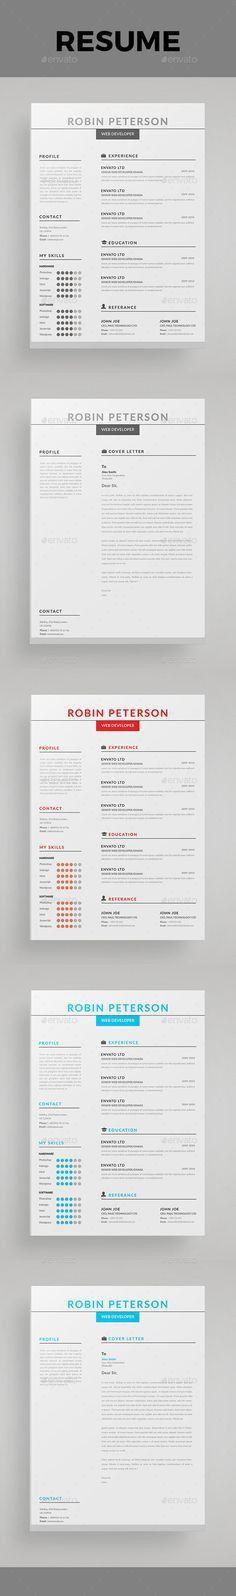 Free Resume Template for Graphic Designer | Misc | Pinterest ...